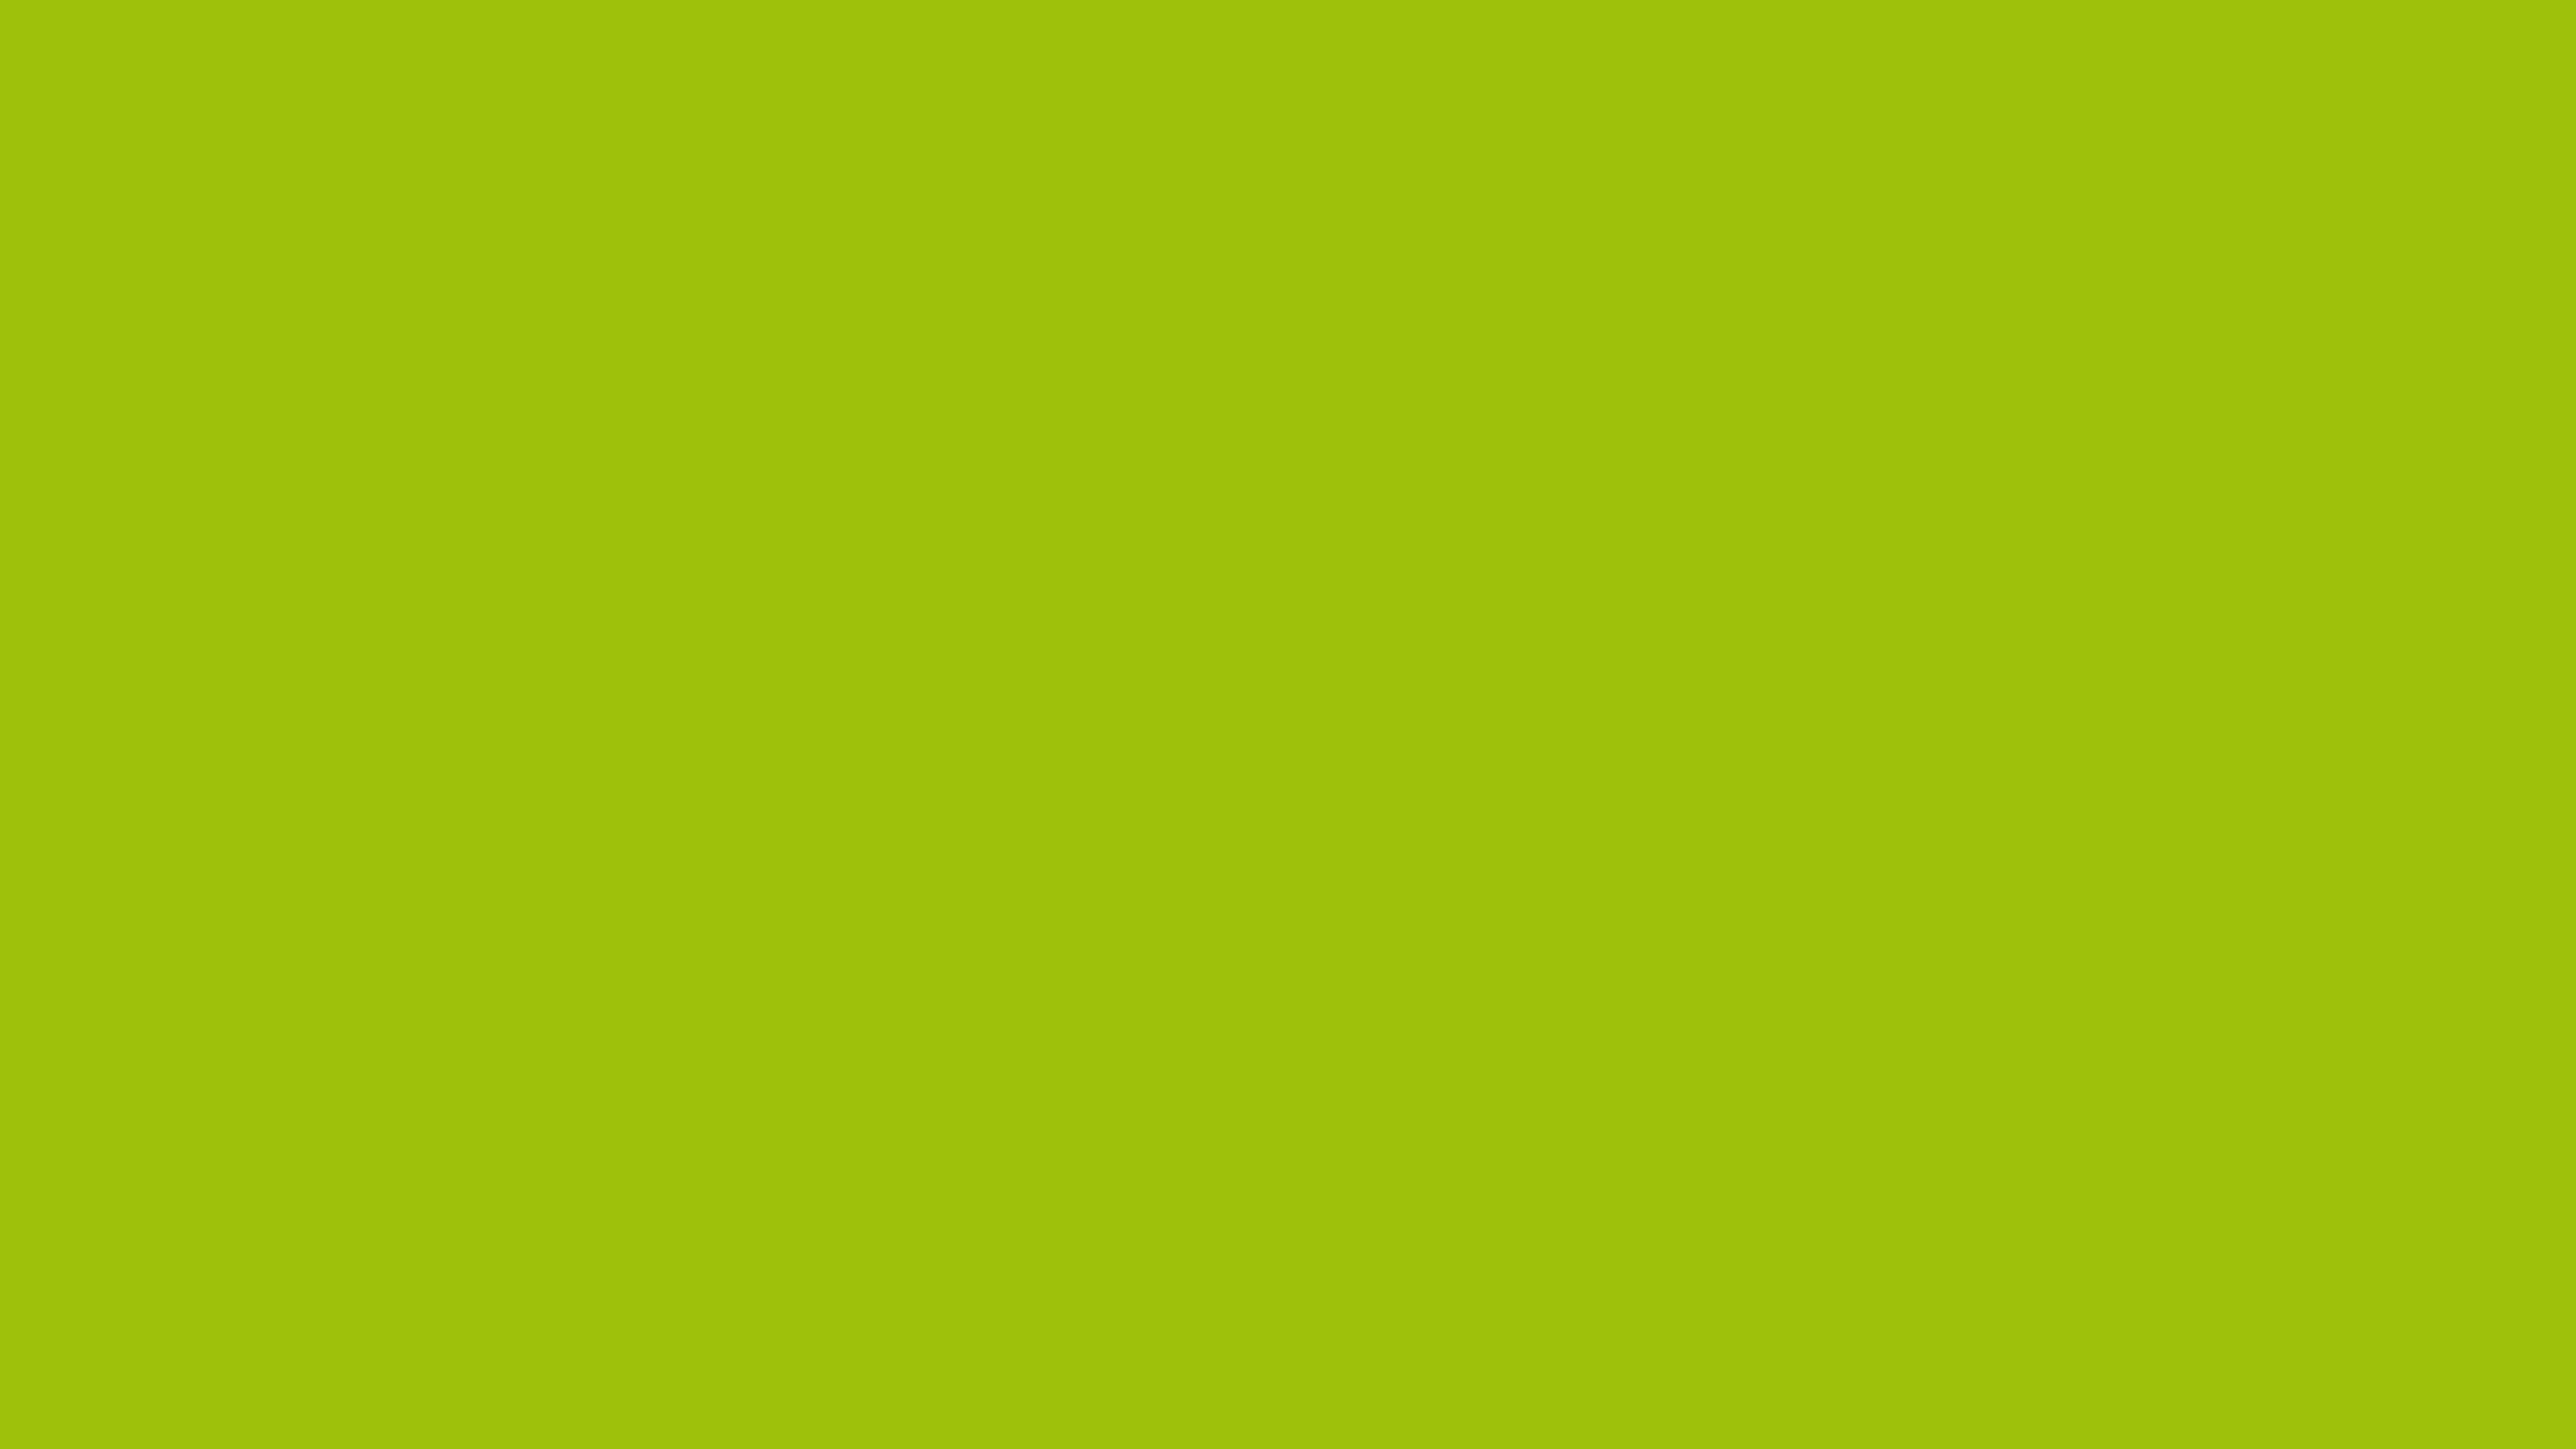 4096x2304 Limerick Solid Color Background